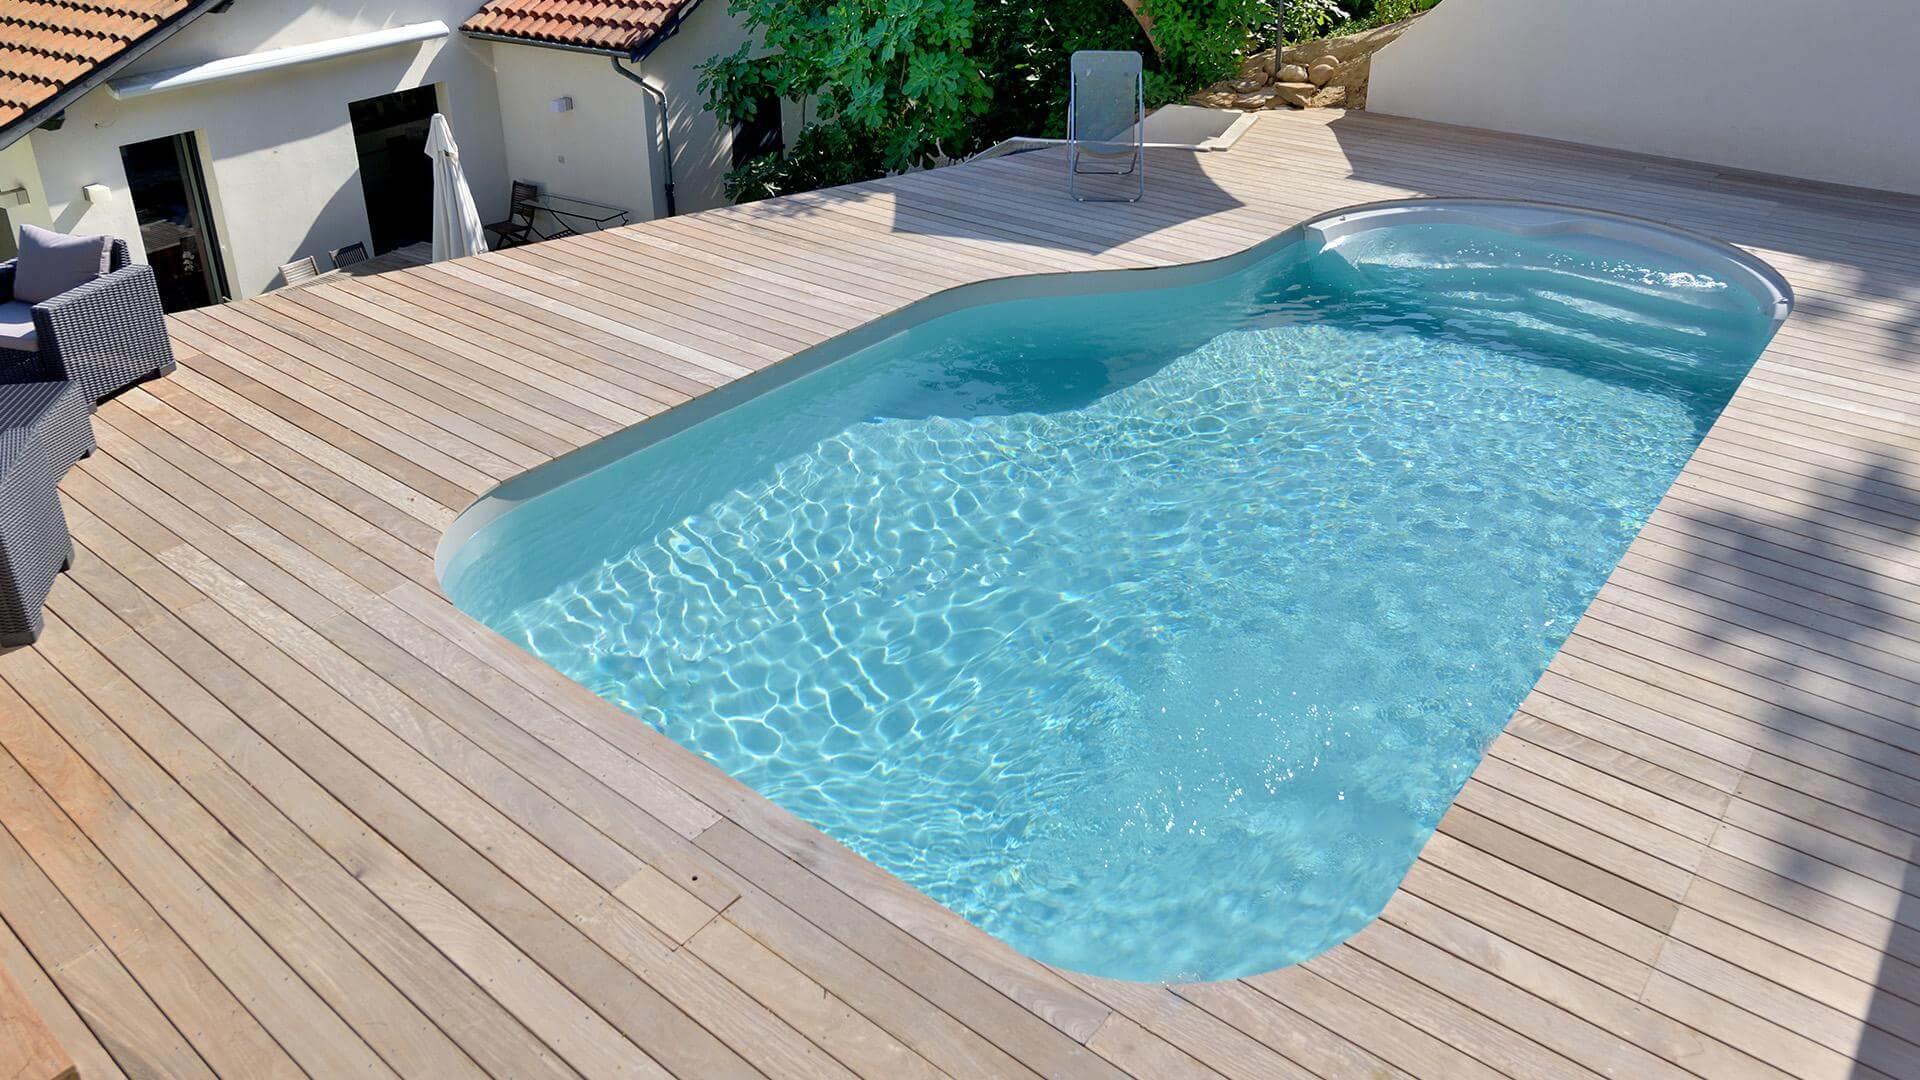 Pool Cléa – fließendes Design in freien Formen | Waterair ...